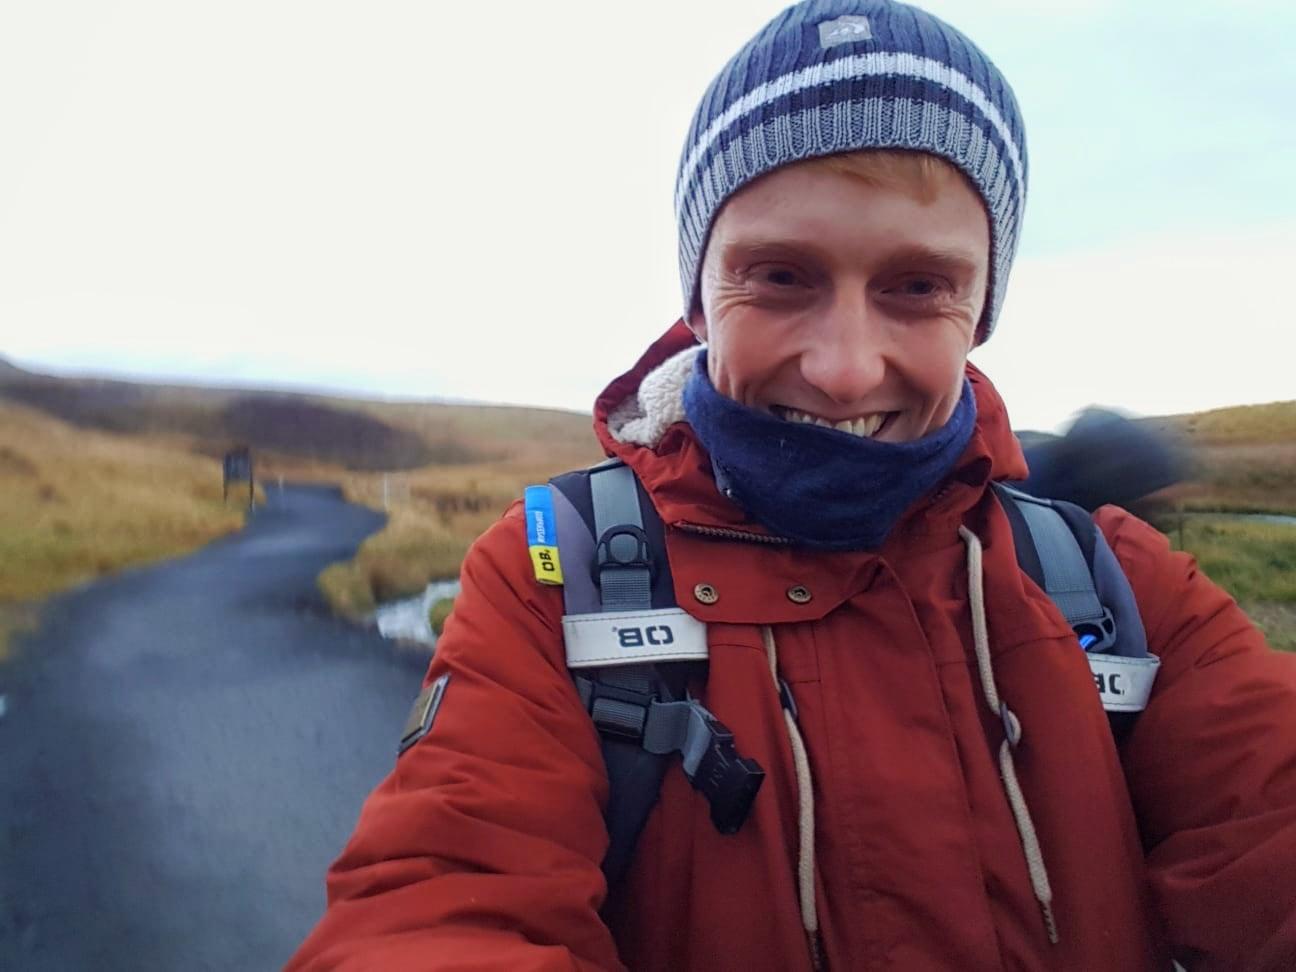 vesícula biliar Simplemente desbordando agrio  Kit Review: Buff | Project X Adventures